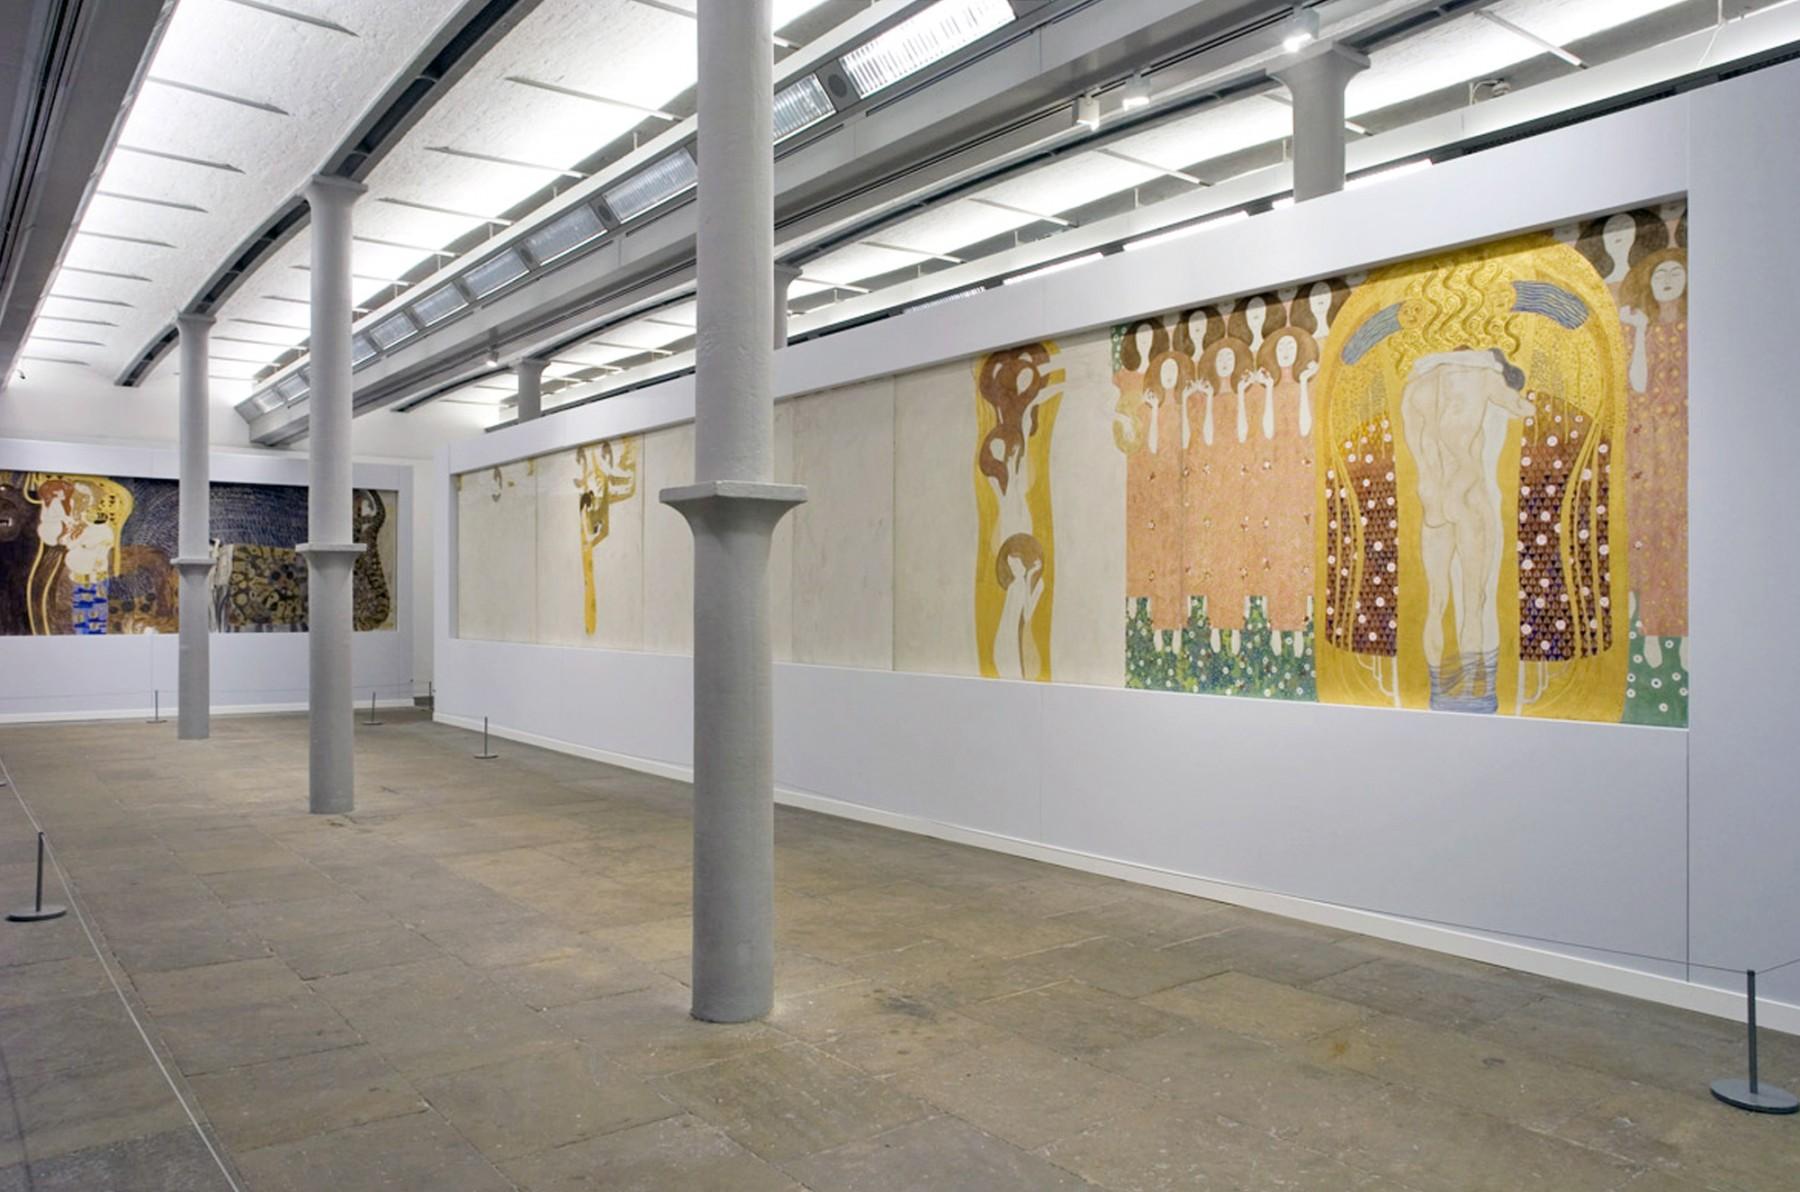 Gustav-Klimt-Painting-Design-Modern-Life-Vienna-Secession-Tate-Liverpool-art-exhibition-gallery-Jamie-Fobert-Architects-4